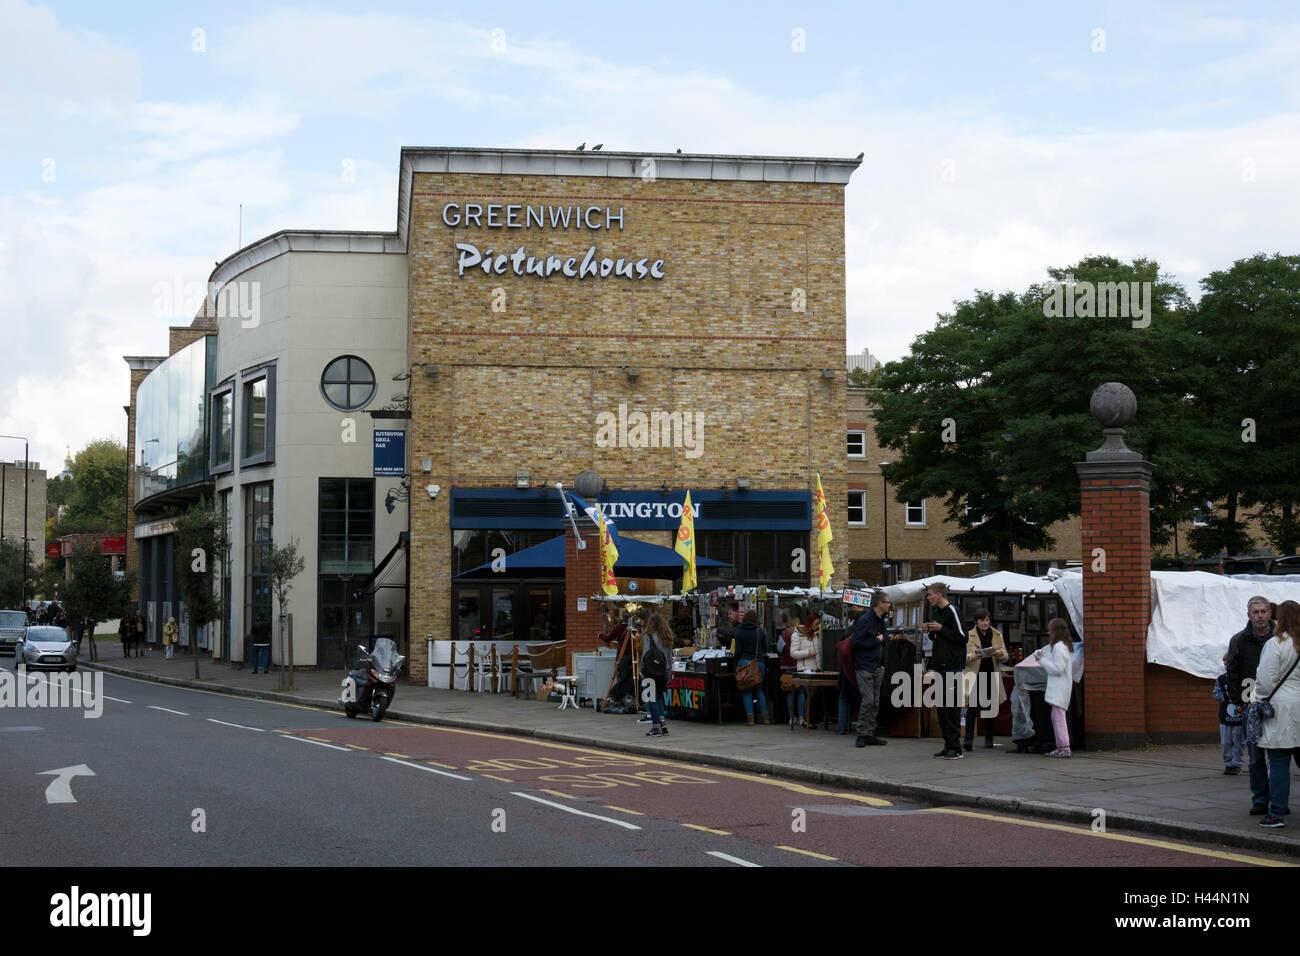 Greenwich Picturehouse, London, UK - Stock Image